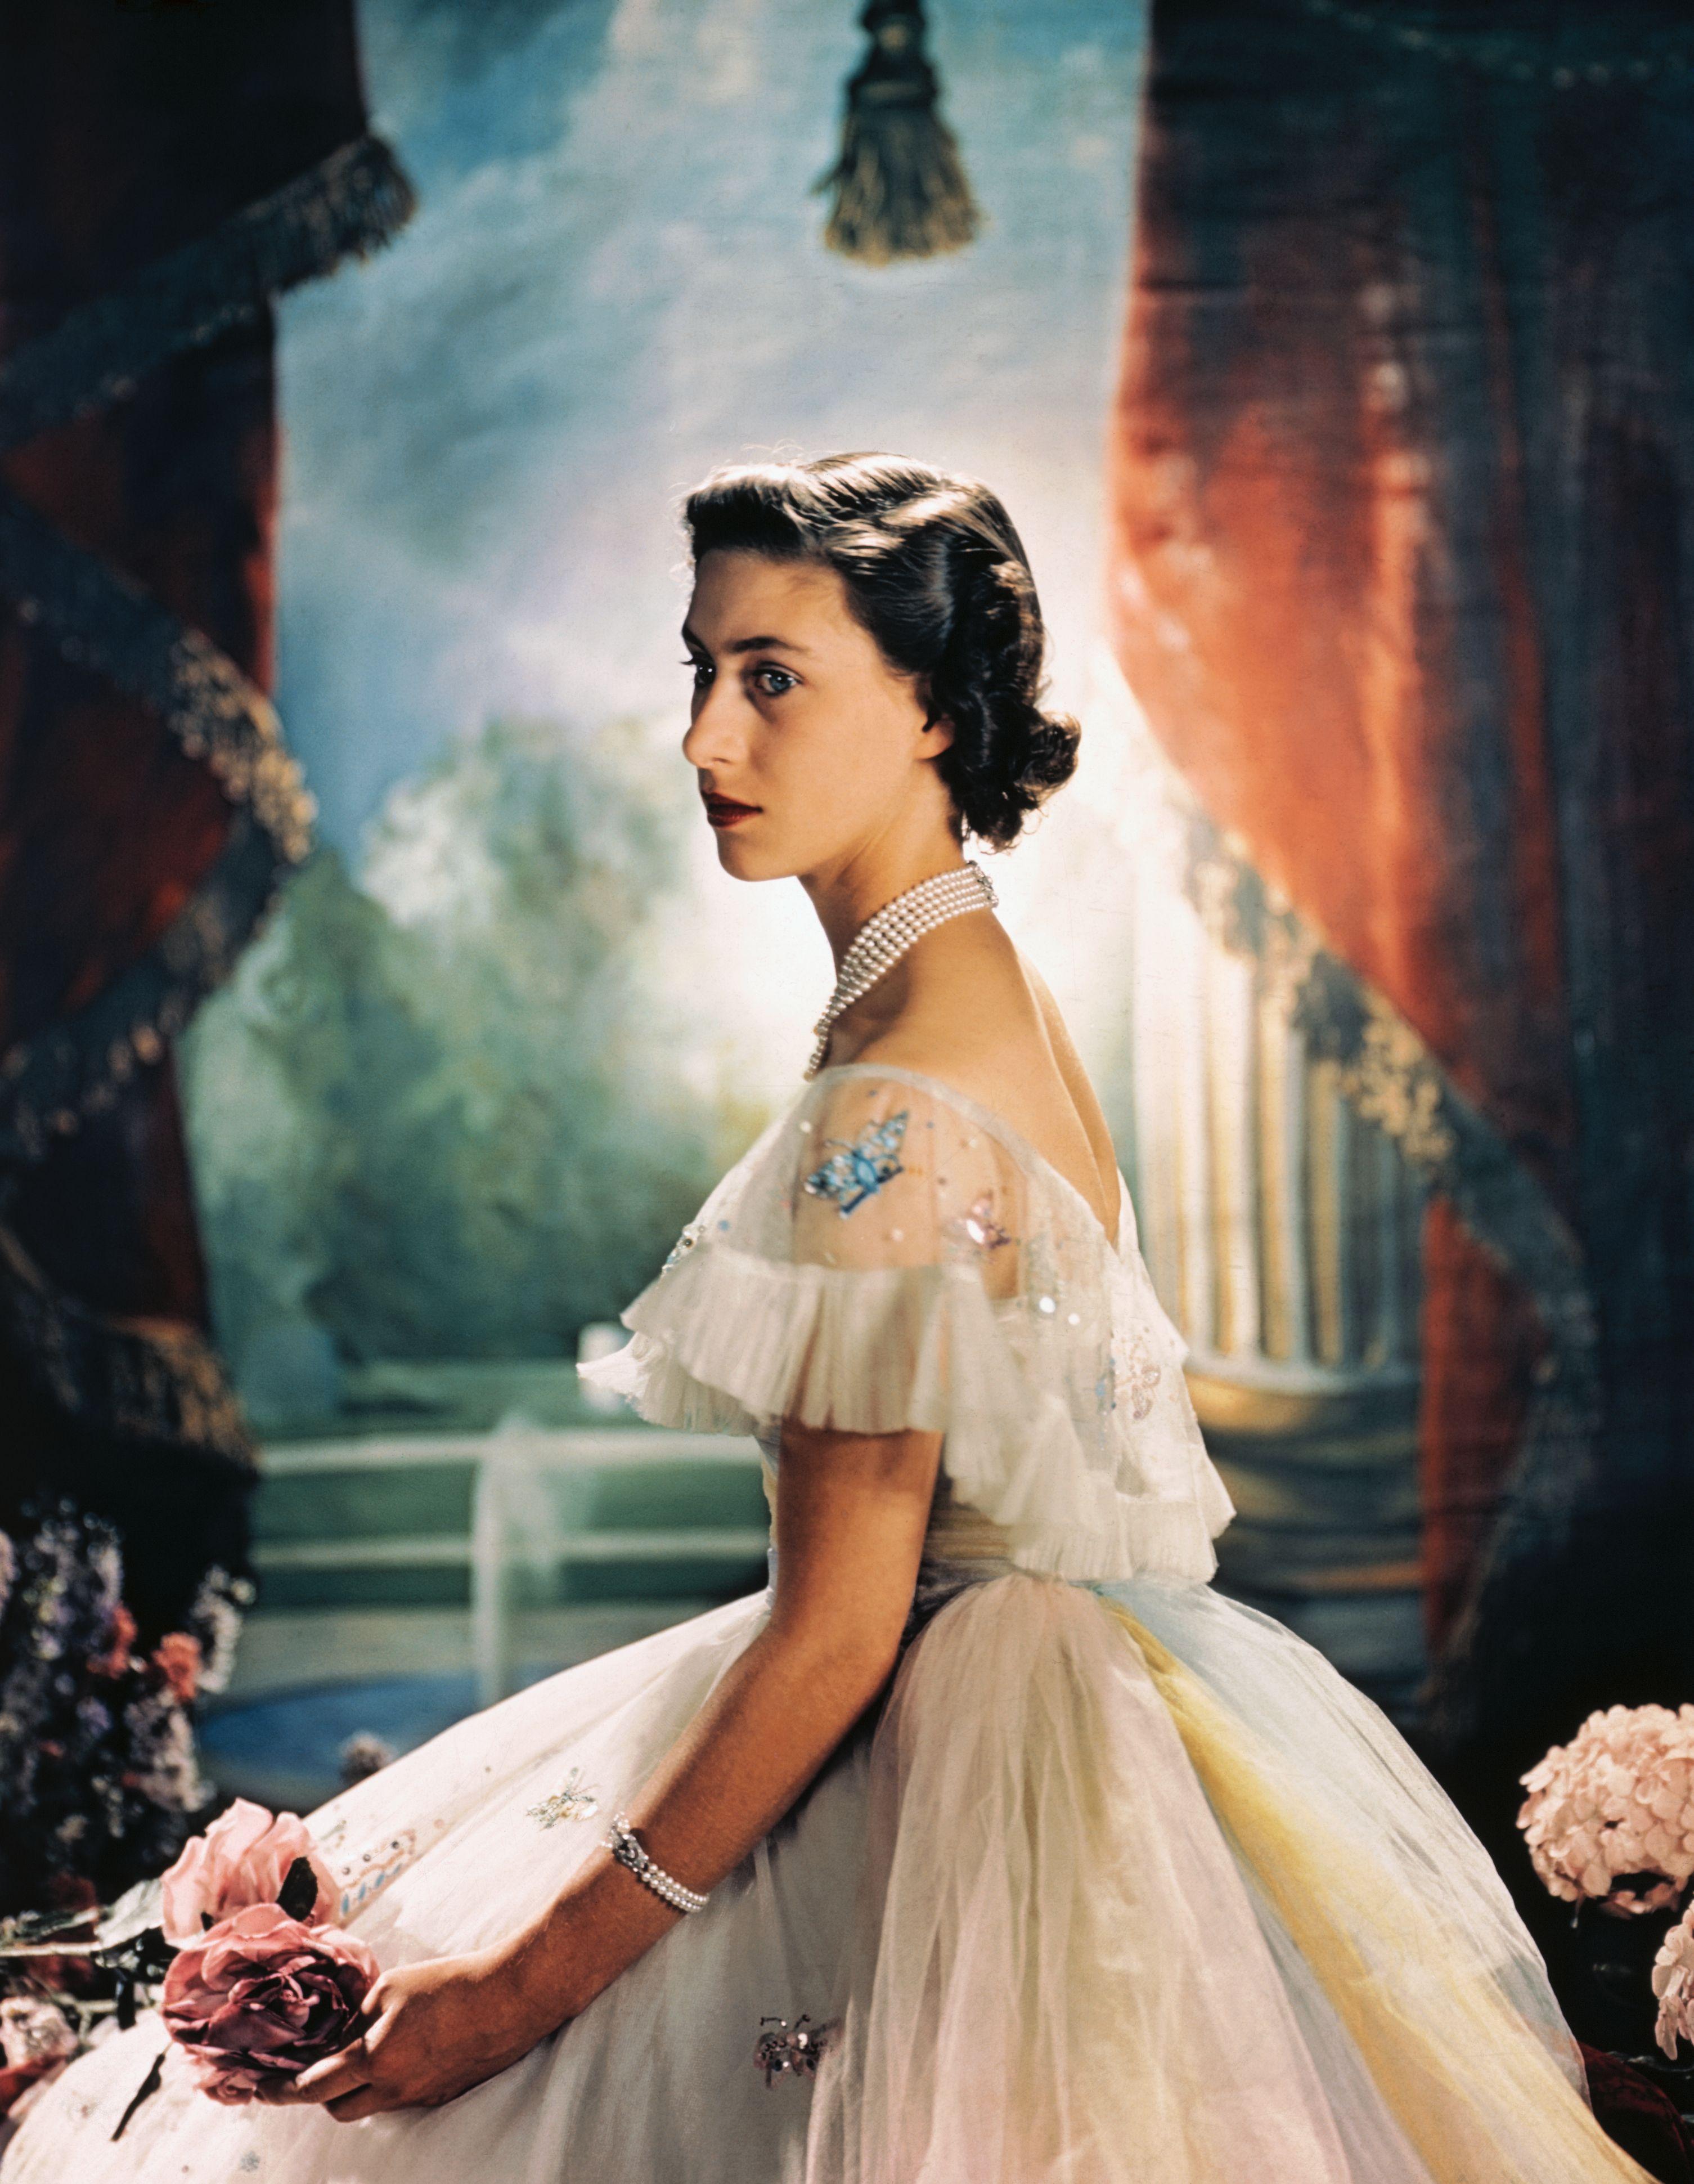 Princess Margaret S Best Fashion Through The Decades Princess